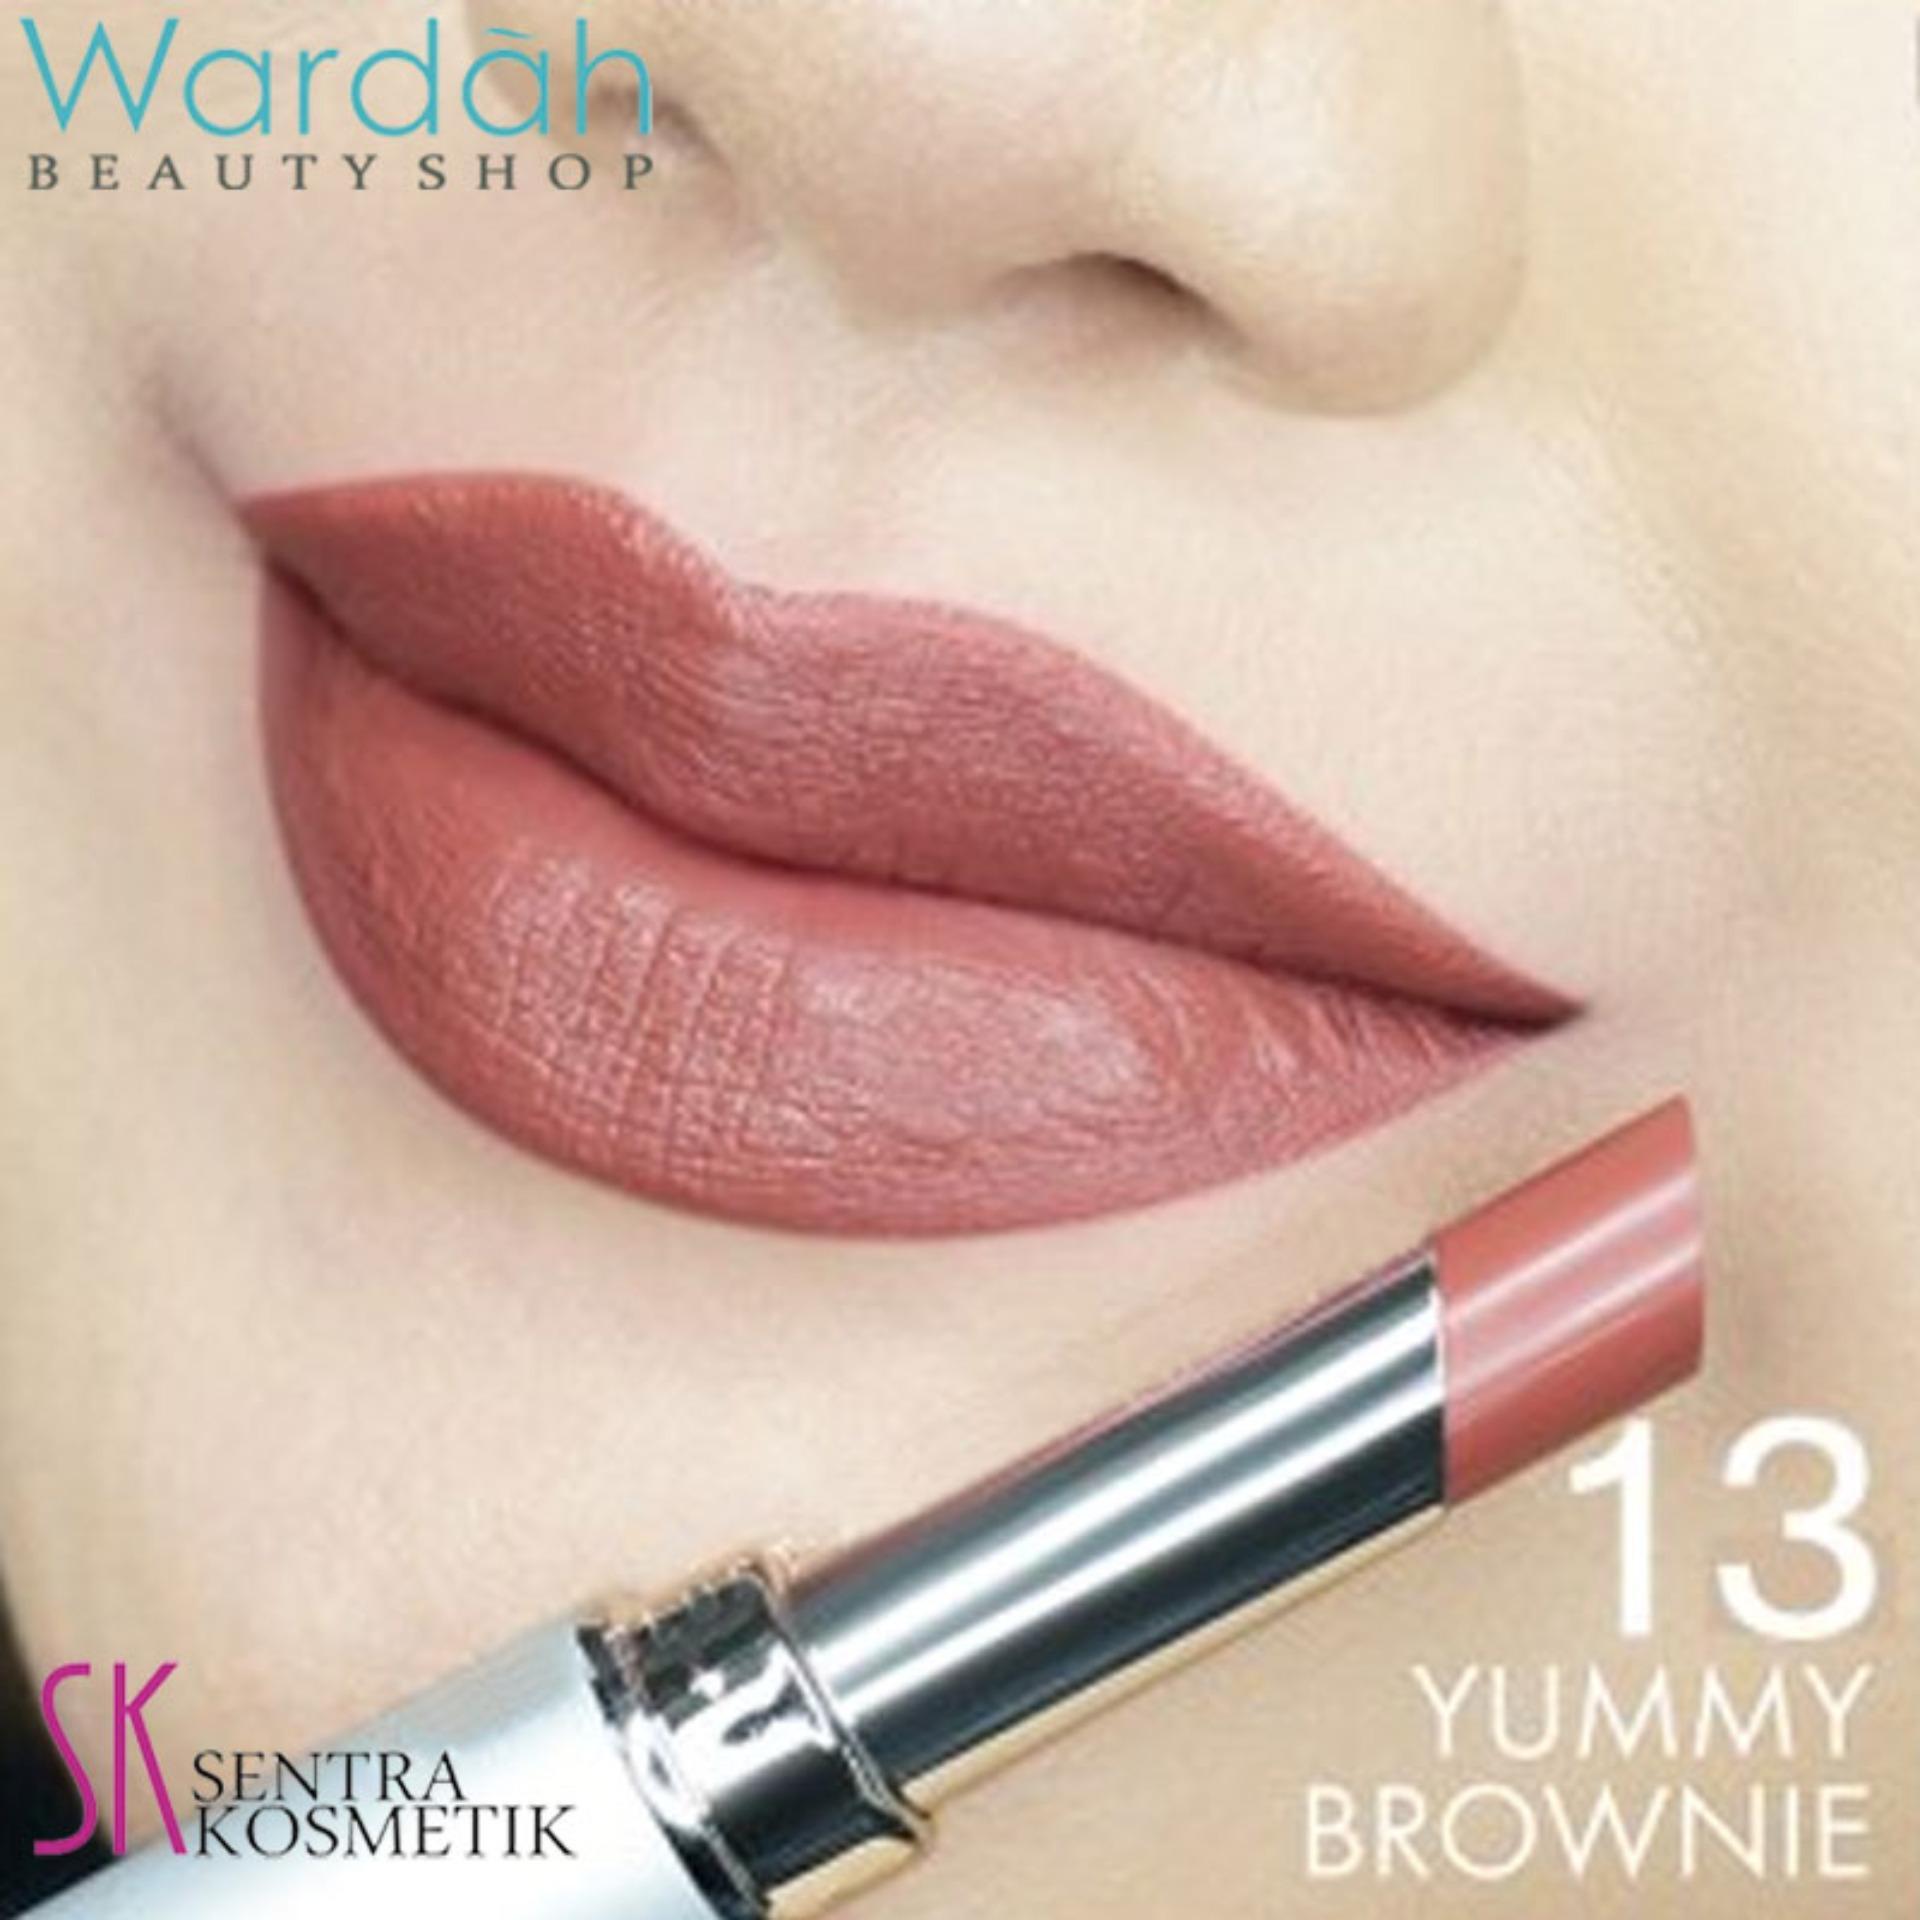 Wardah INTENSE MATTE LIPSTICK 13 - Yummy Brownie